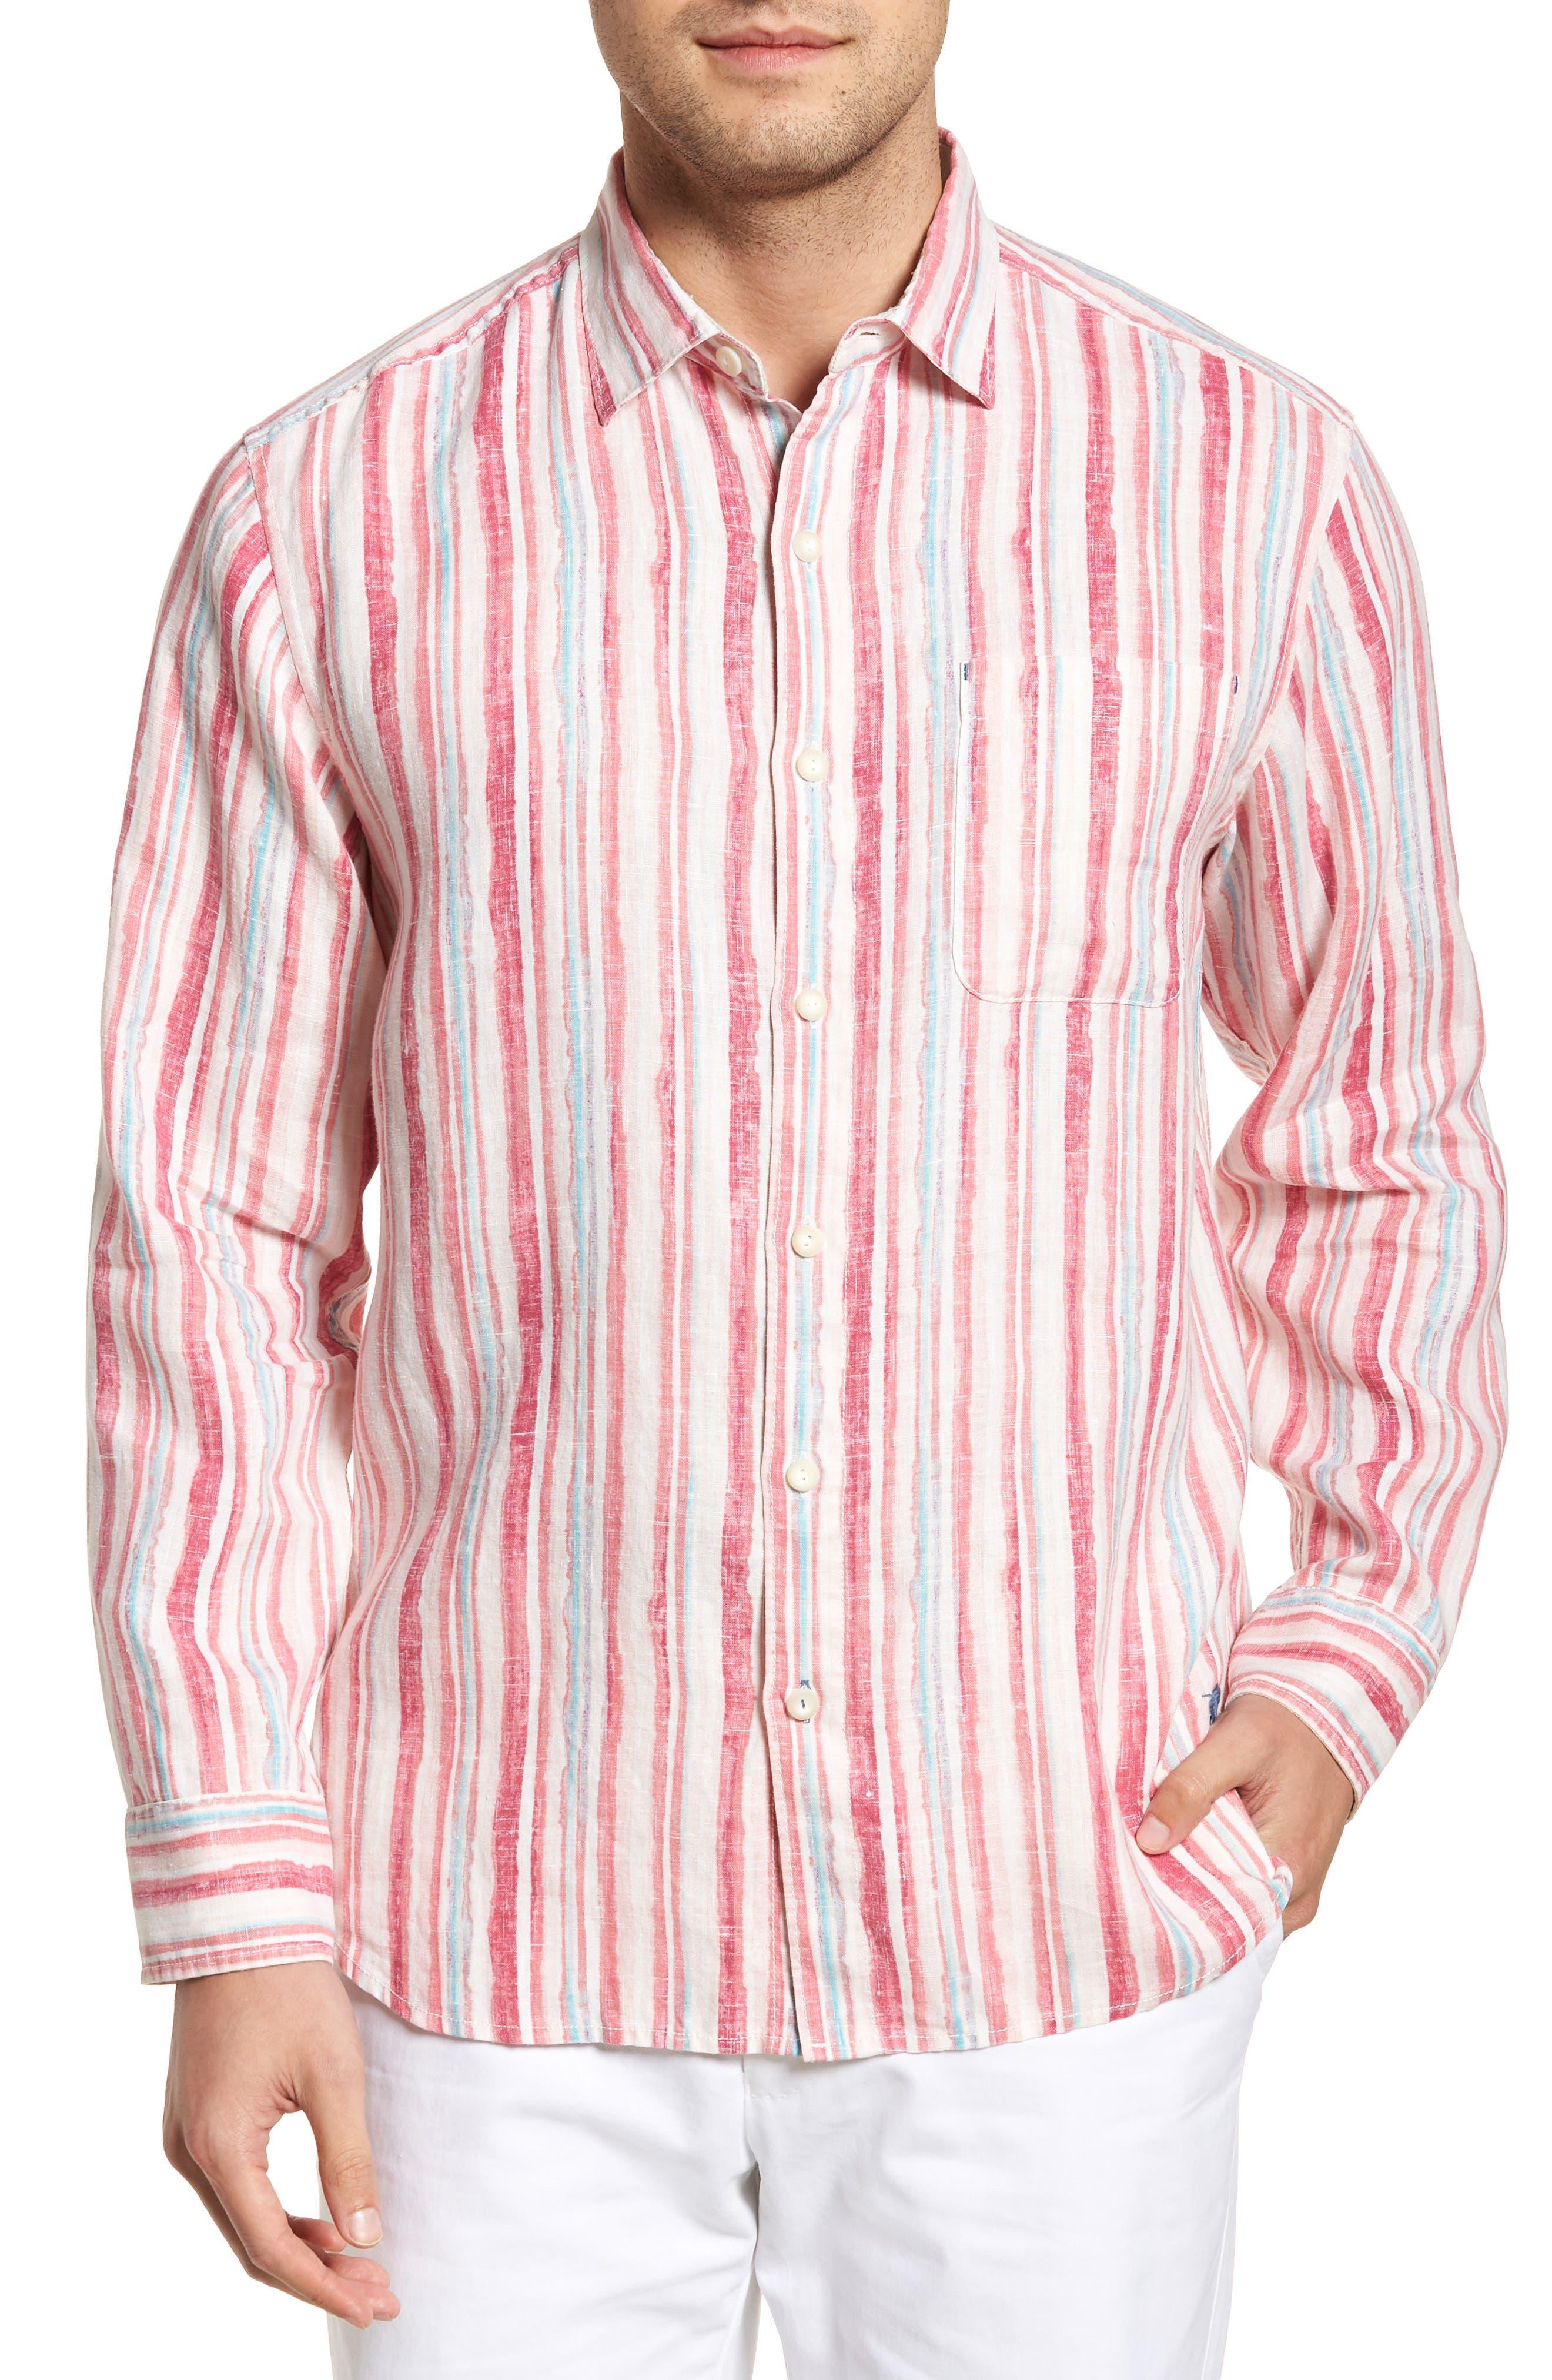 Main Image - Tommy Bahama Watercrest Stripe Linen Sport Shirt